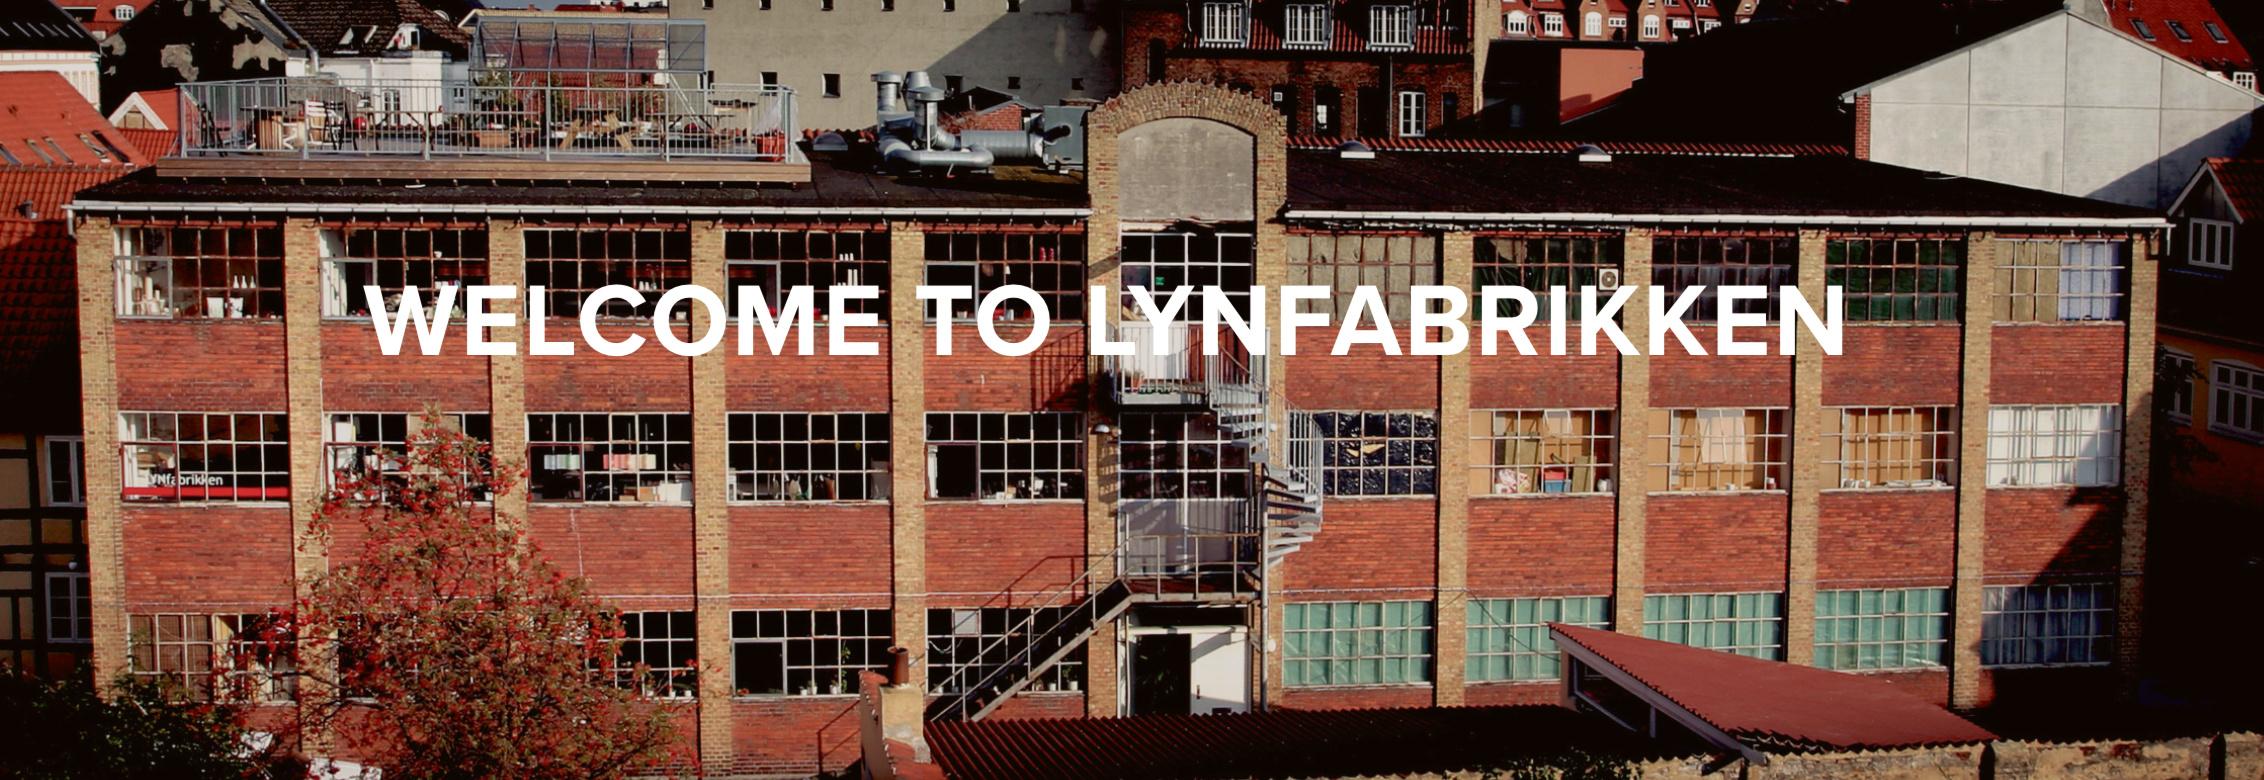 cph:learning flytter ind på Lynfabrikken i Aarhus